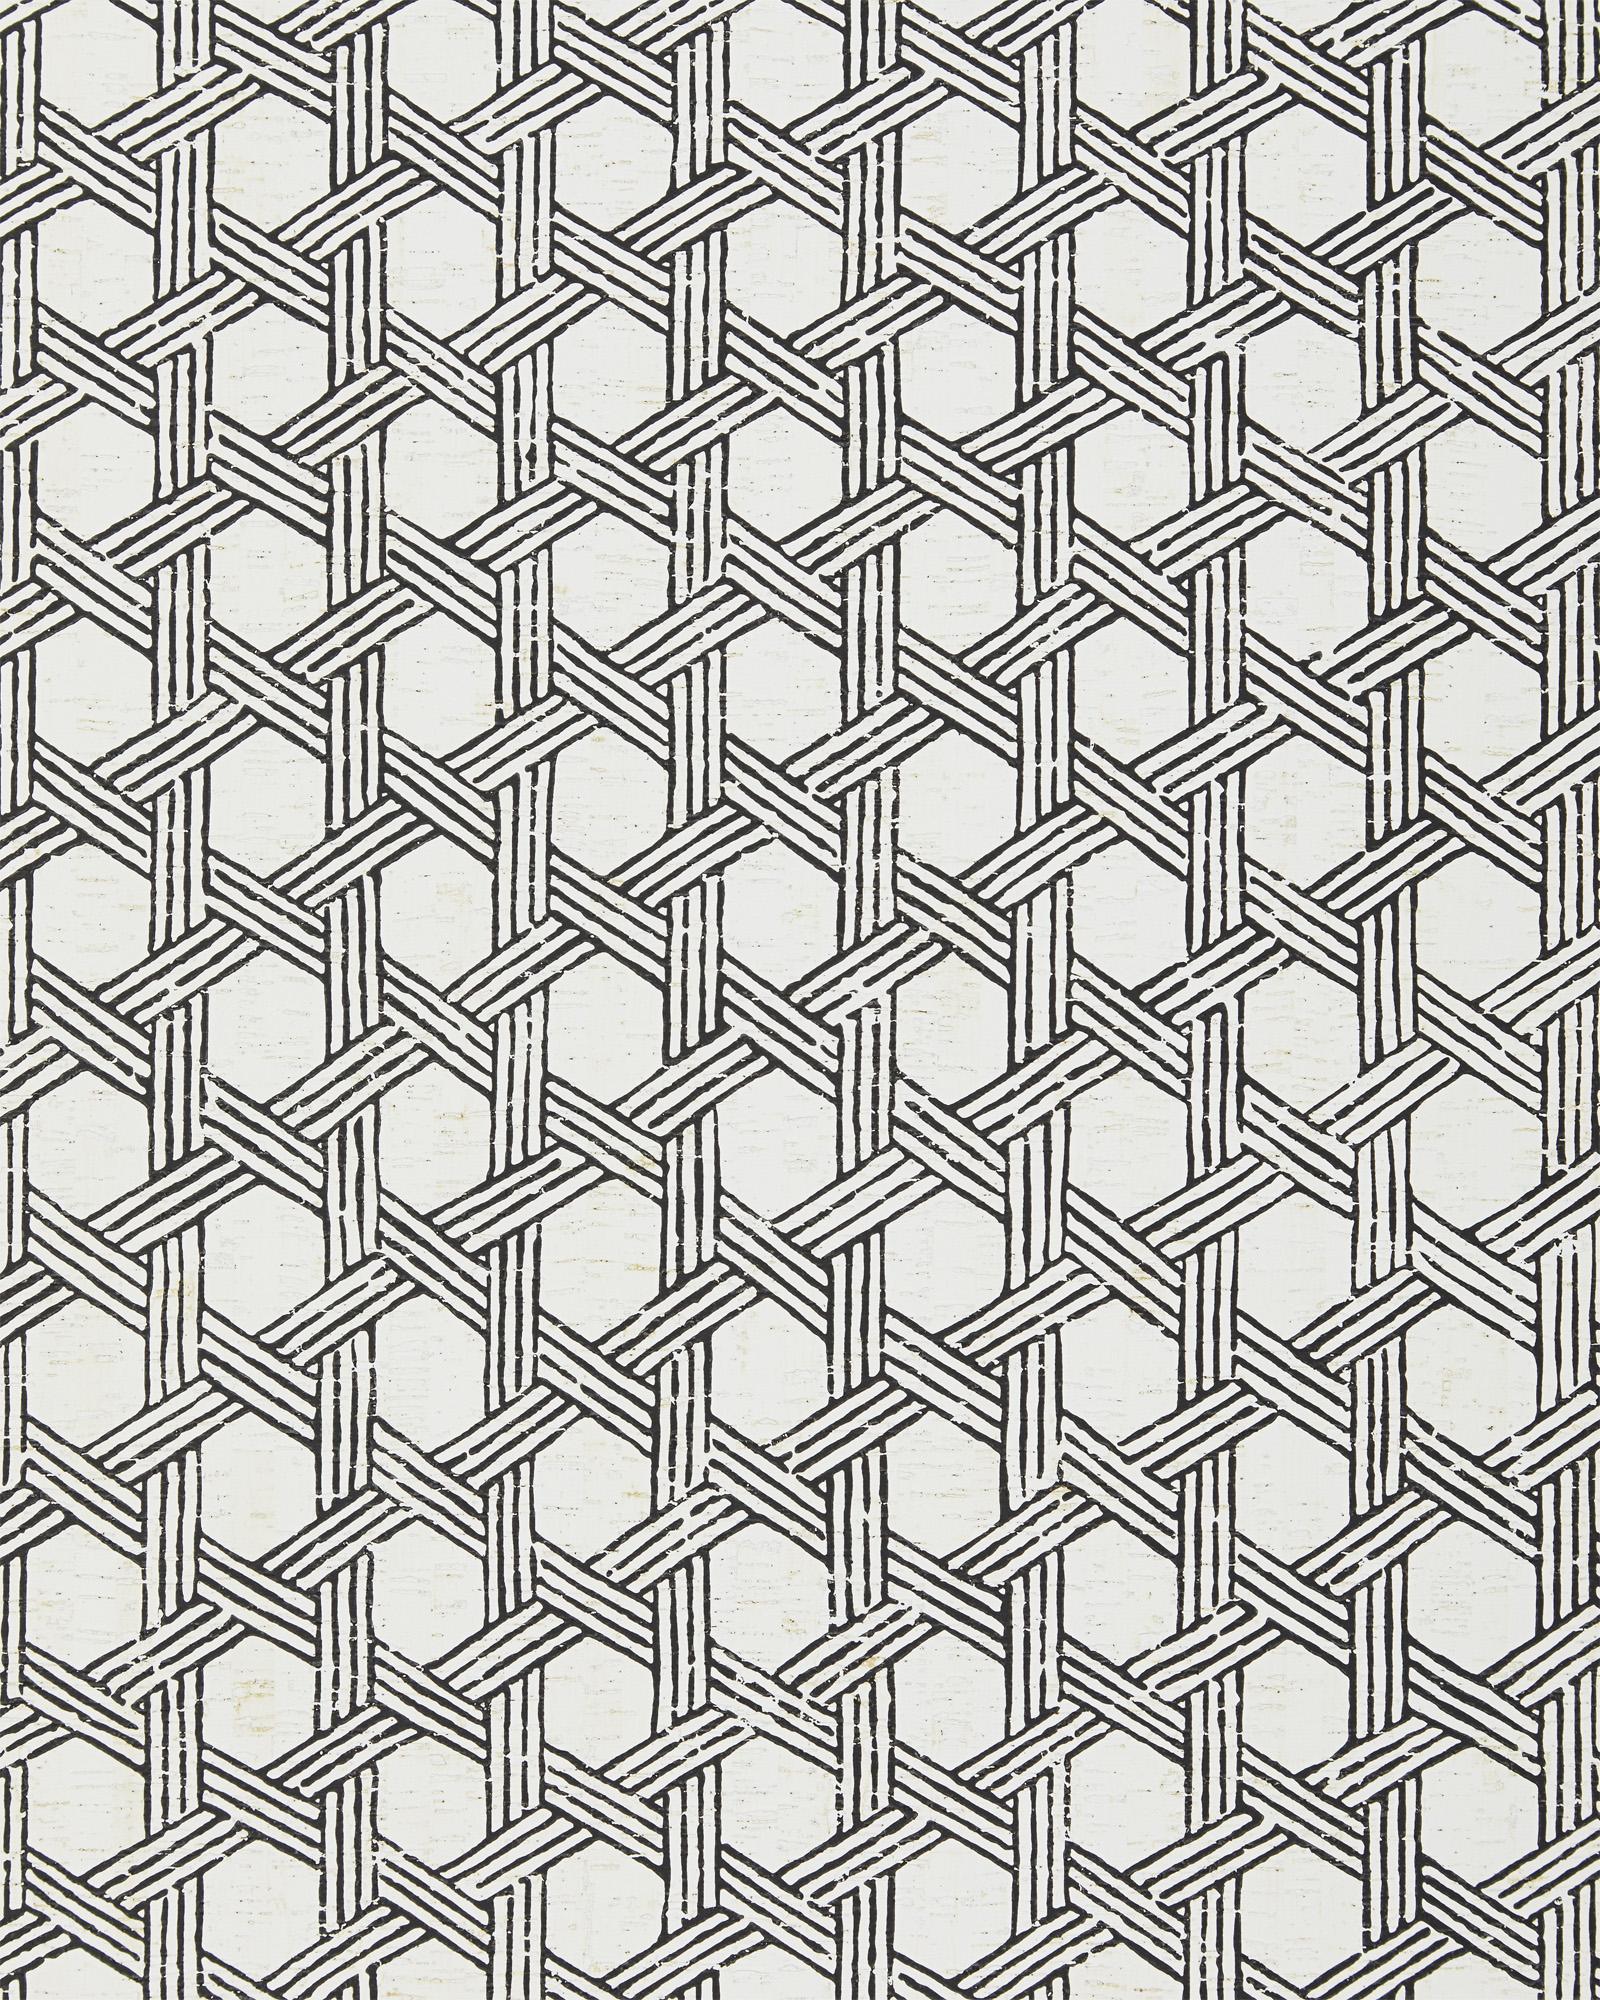 Wallpaper_Full_Cayman_Black_White_Cork_MV_Crop_BASE.jpg